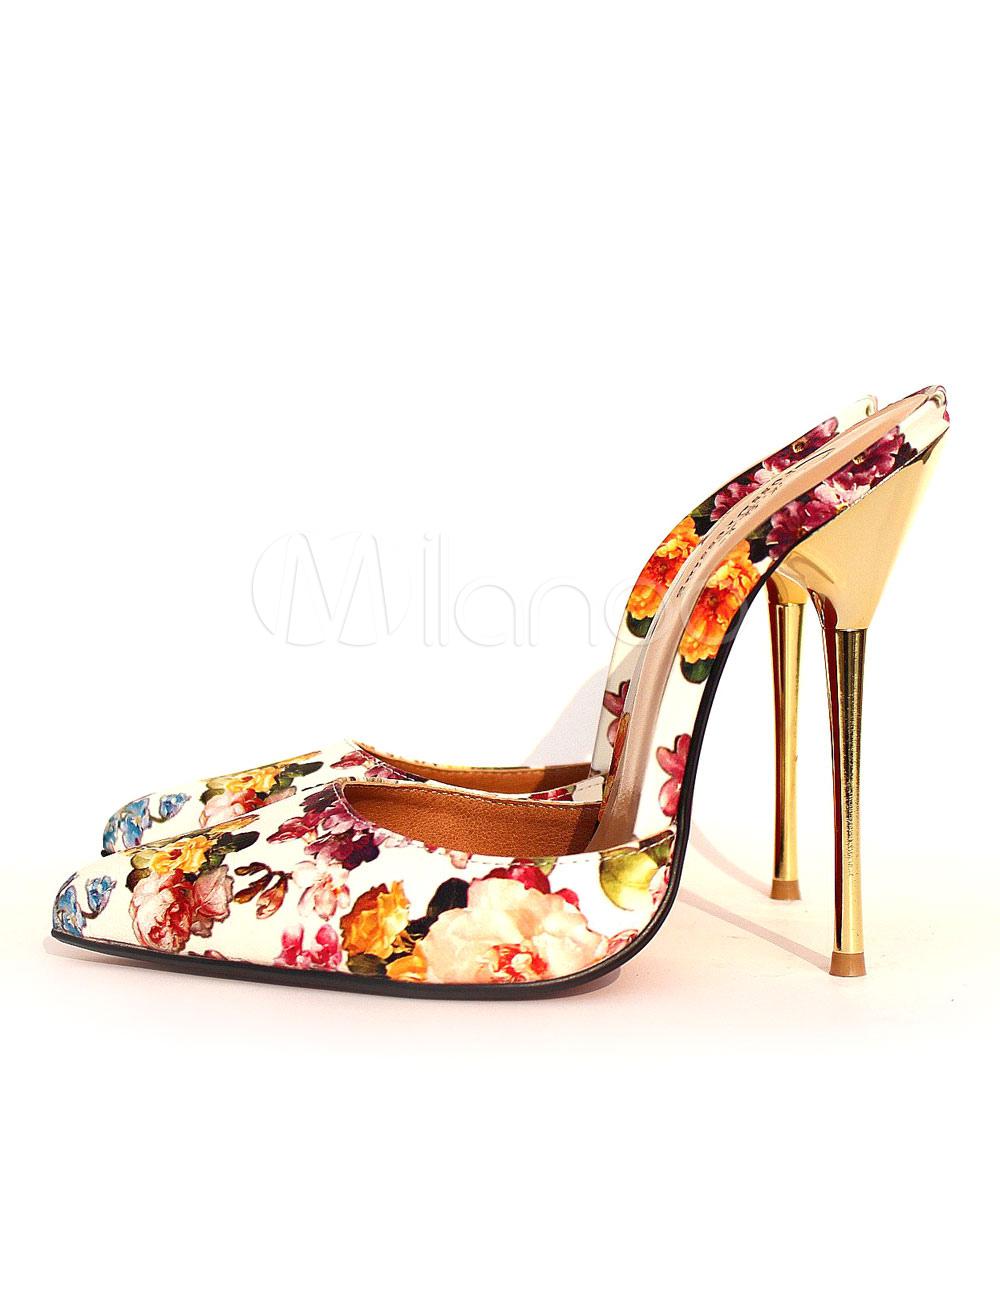 Women's Mule Sandals High Heel Floral Printed Almond PU Stiletto Heel Slippers